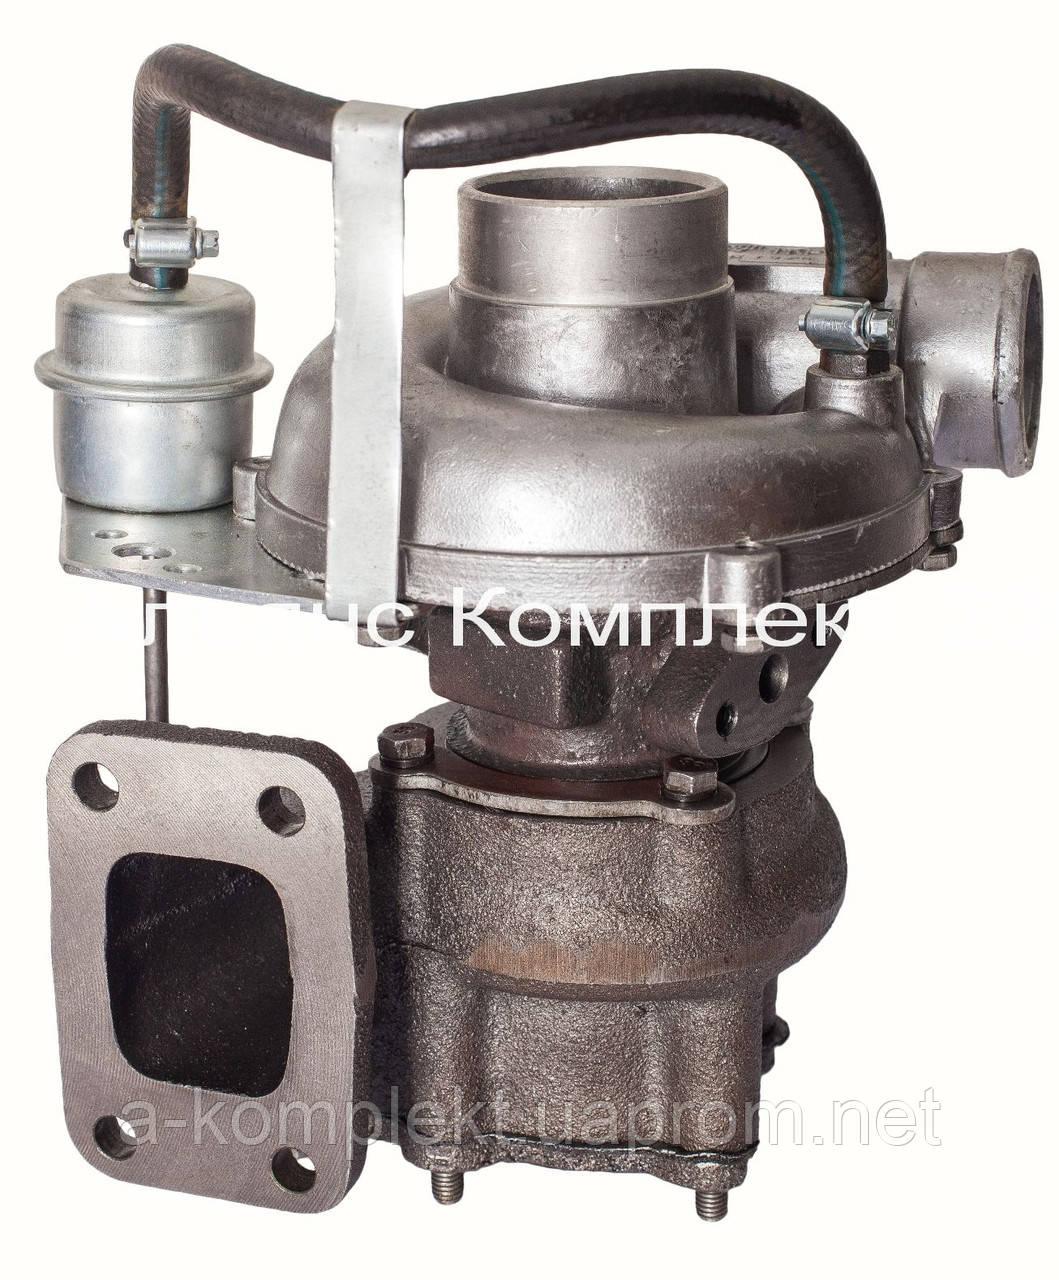 Турбокомпрессор ТКР 6.1 - 01 с клапаном (620.000-01)